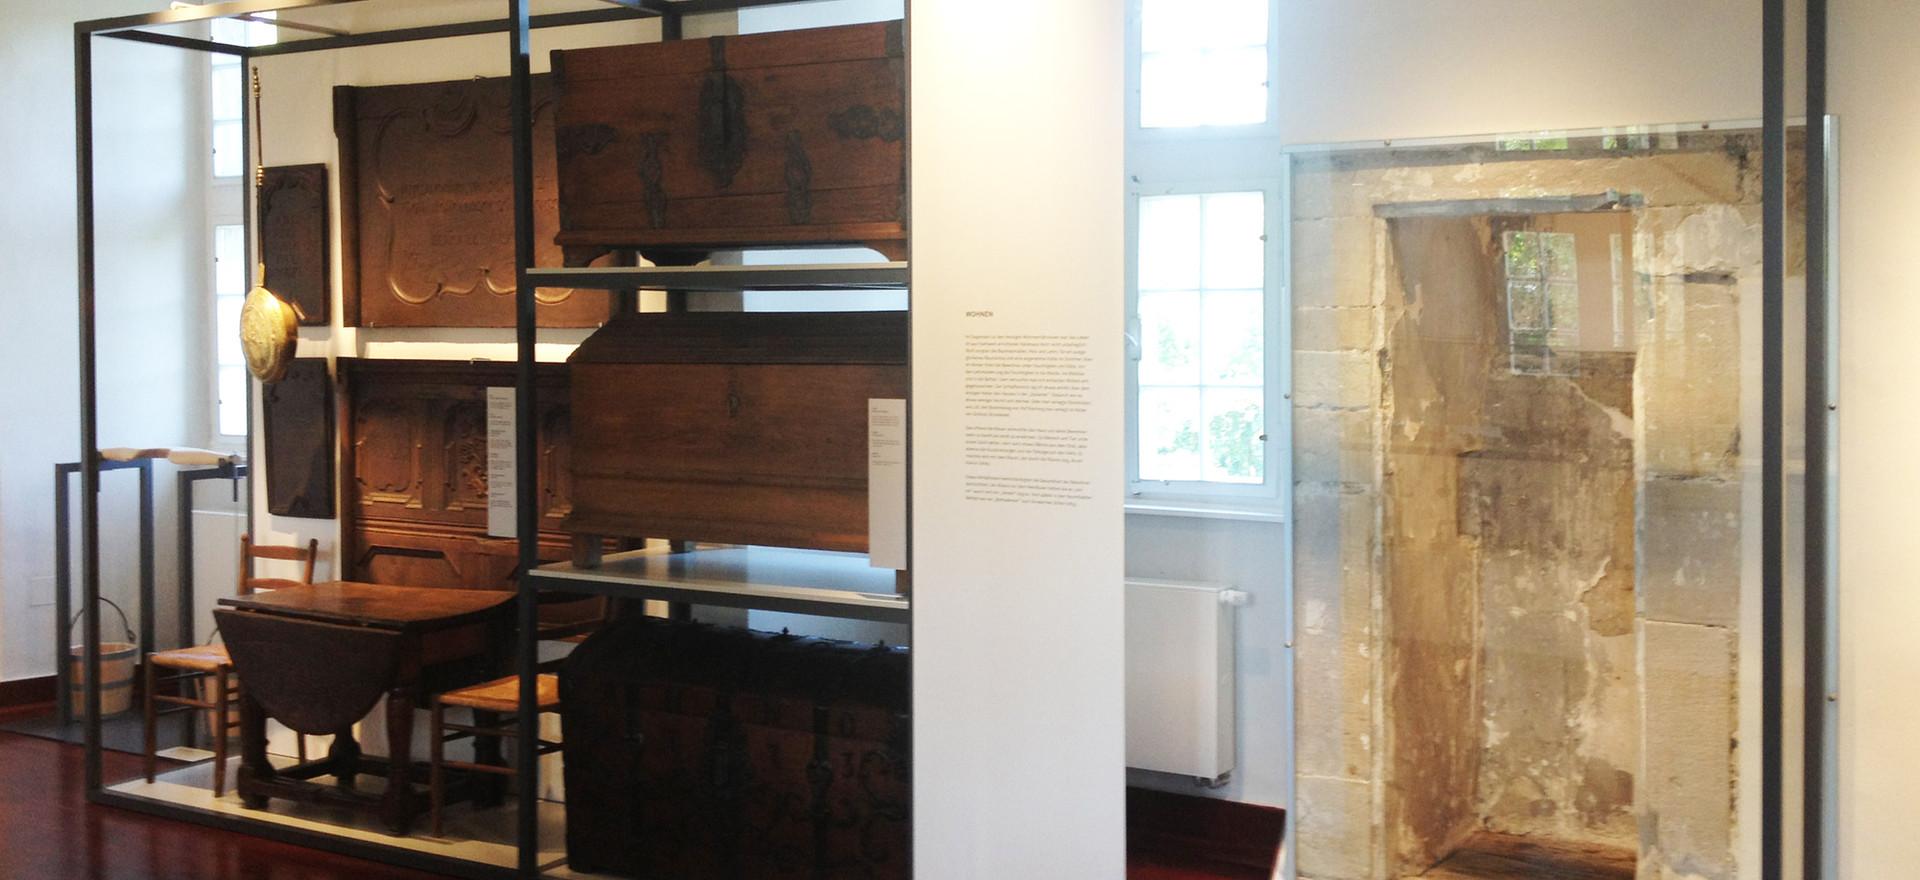 Emschertal-Museum Herne im Schloss Strünkede